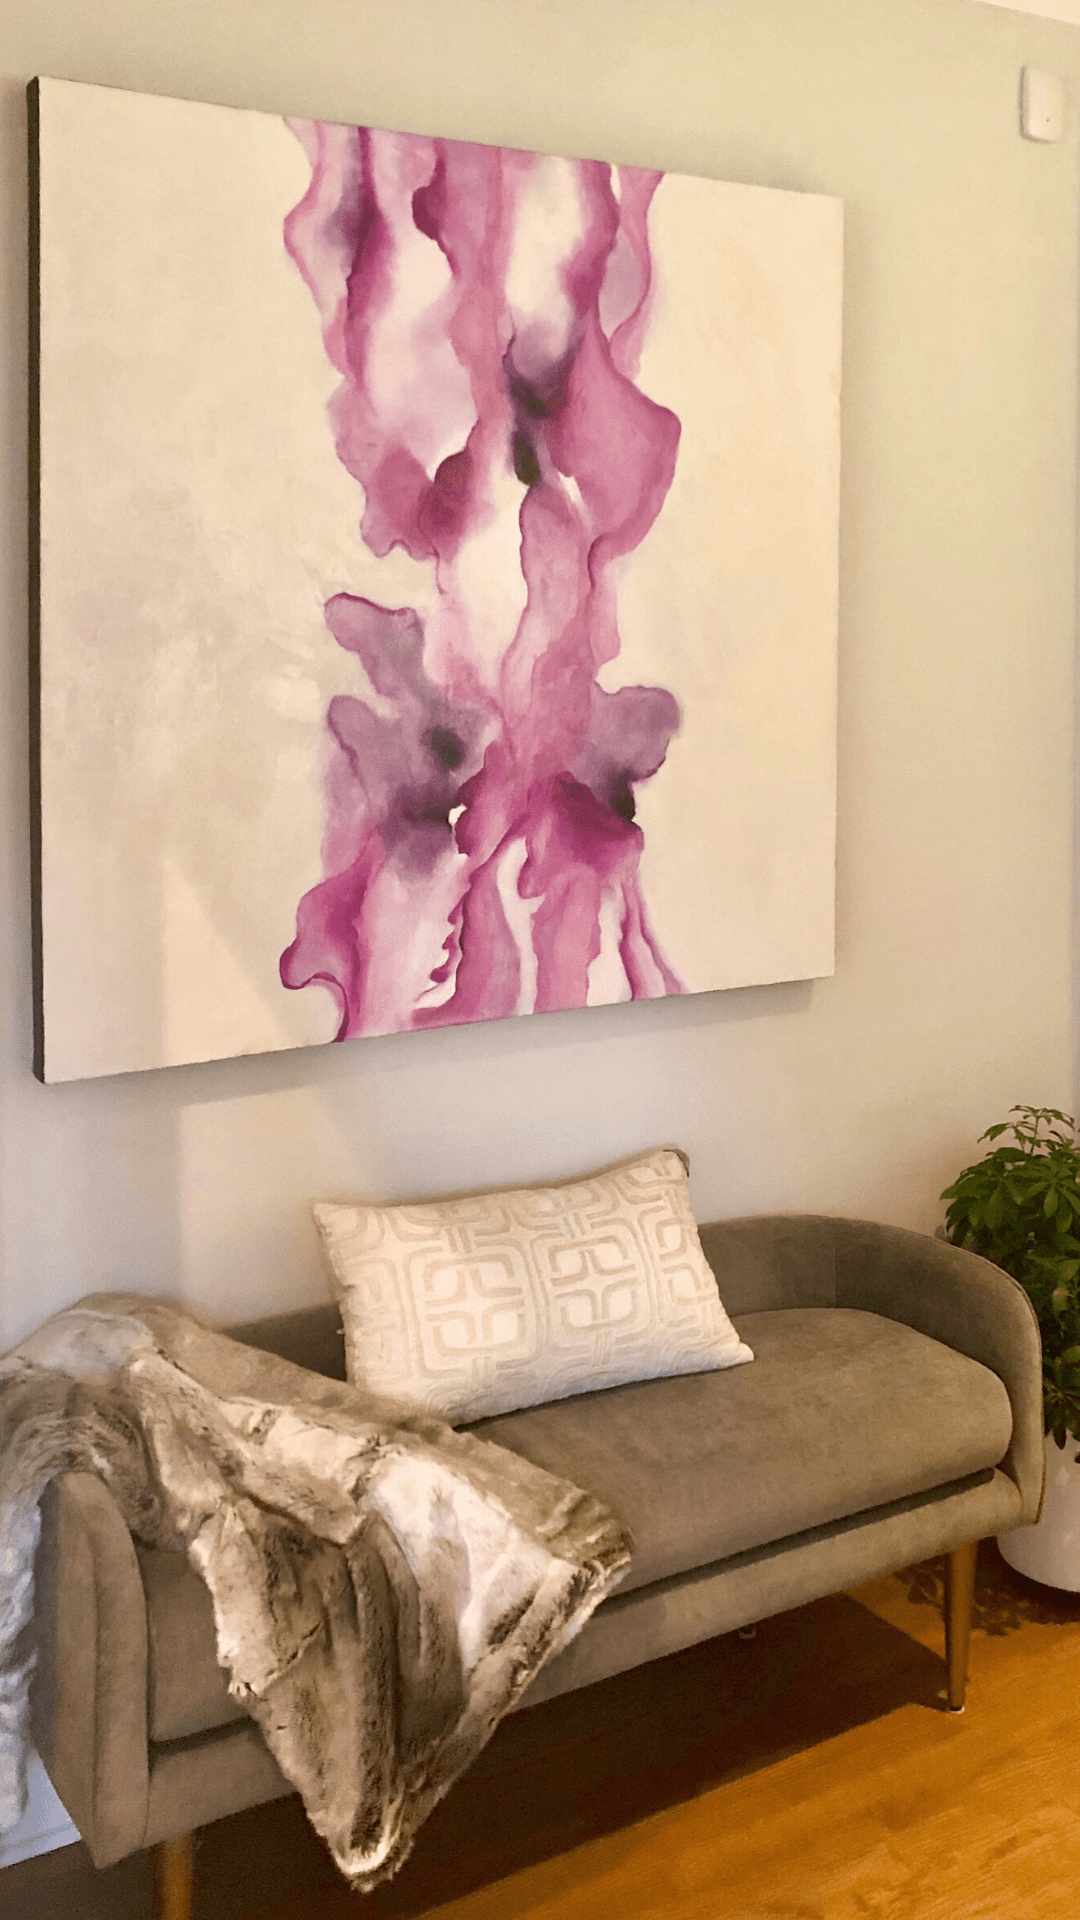 installed art